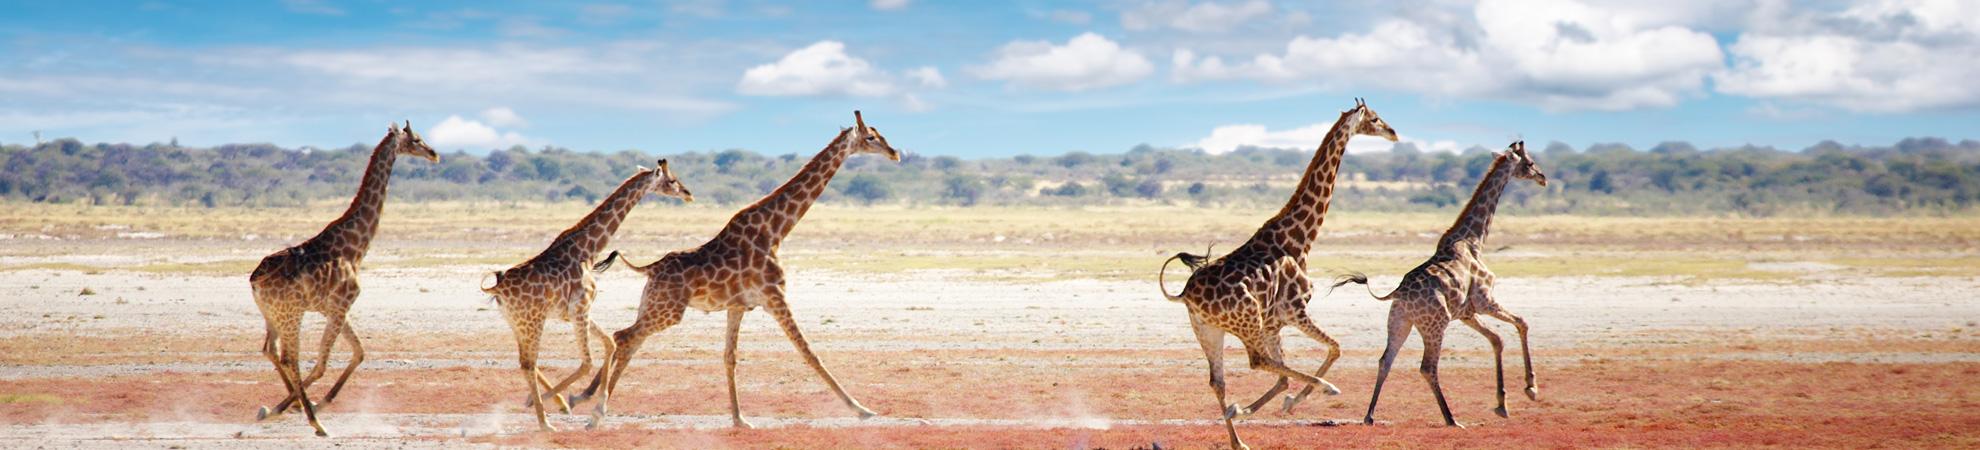 Namibie voyage organisé